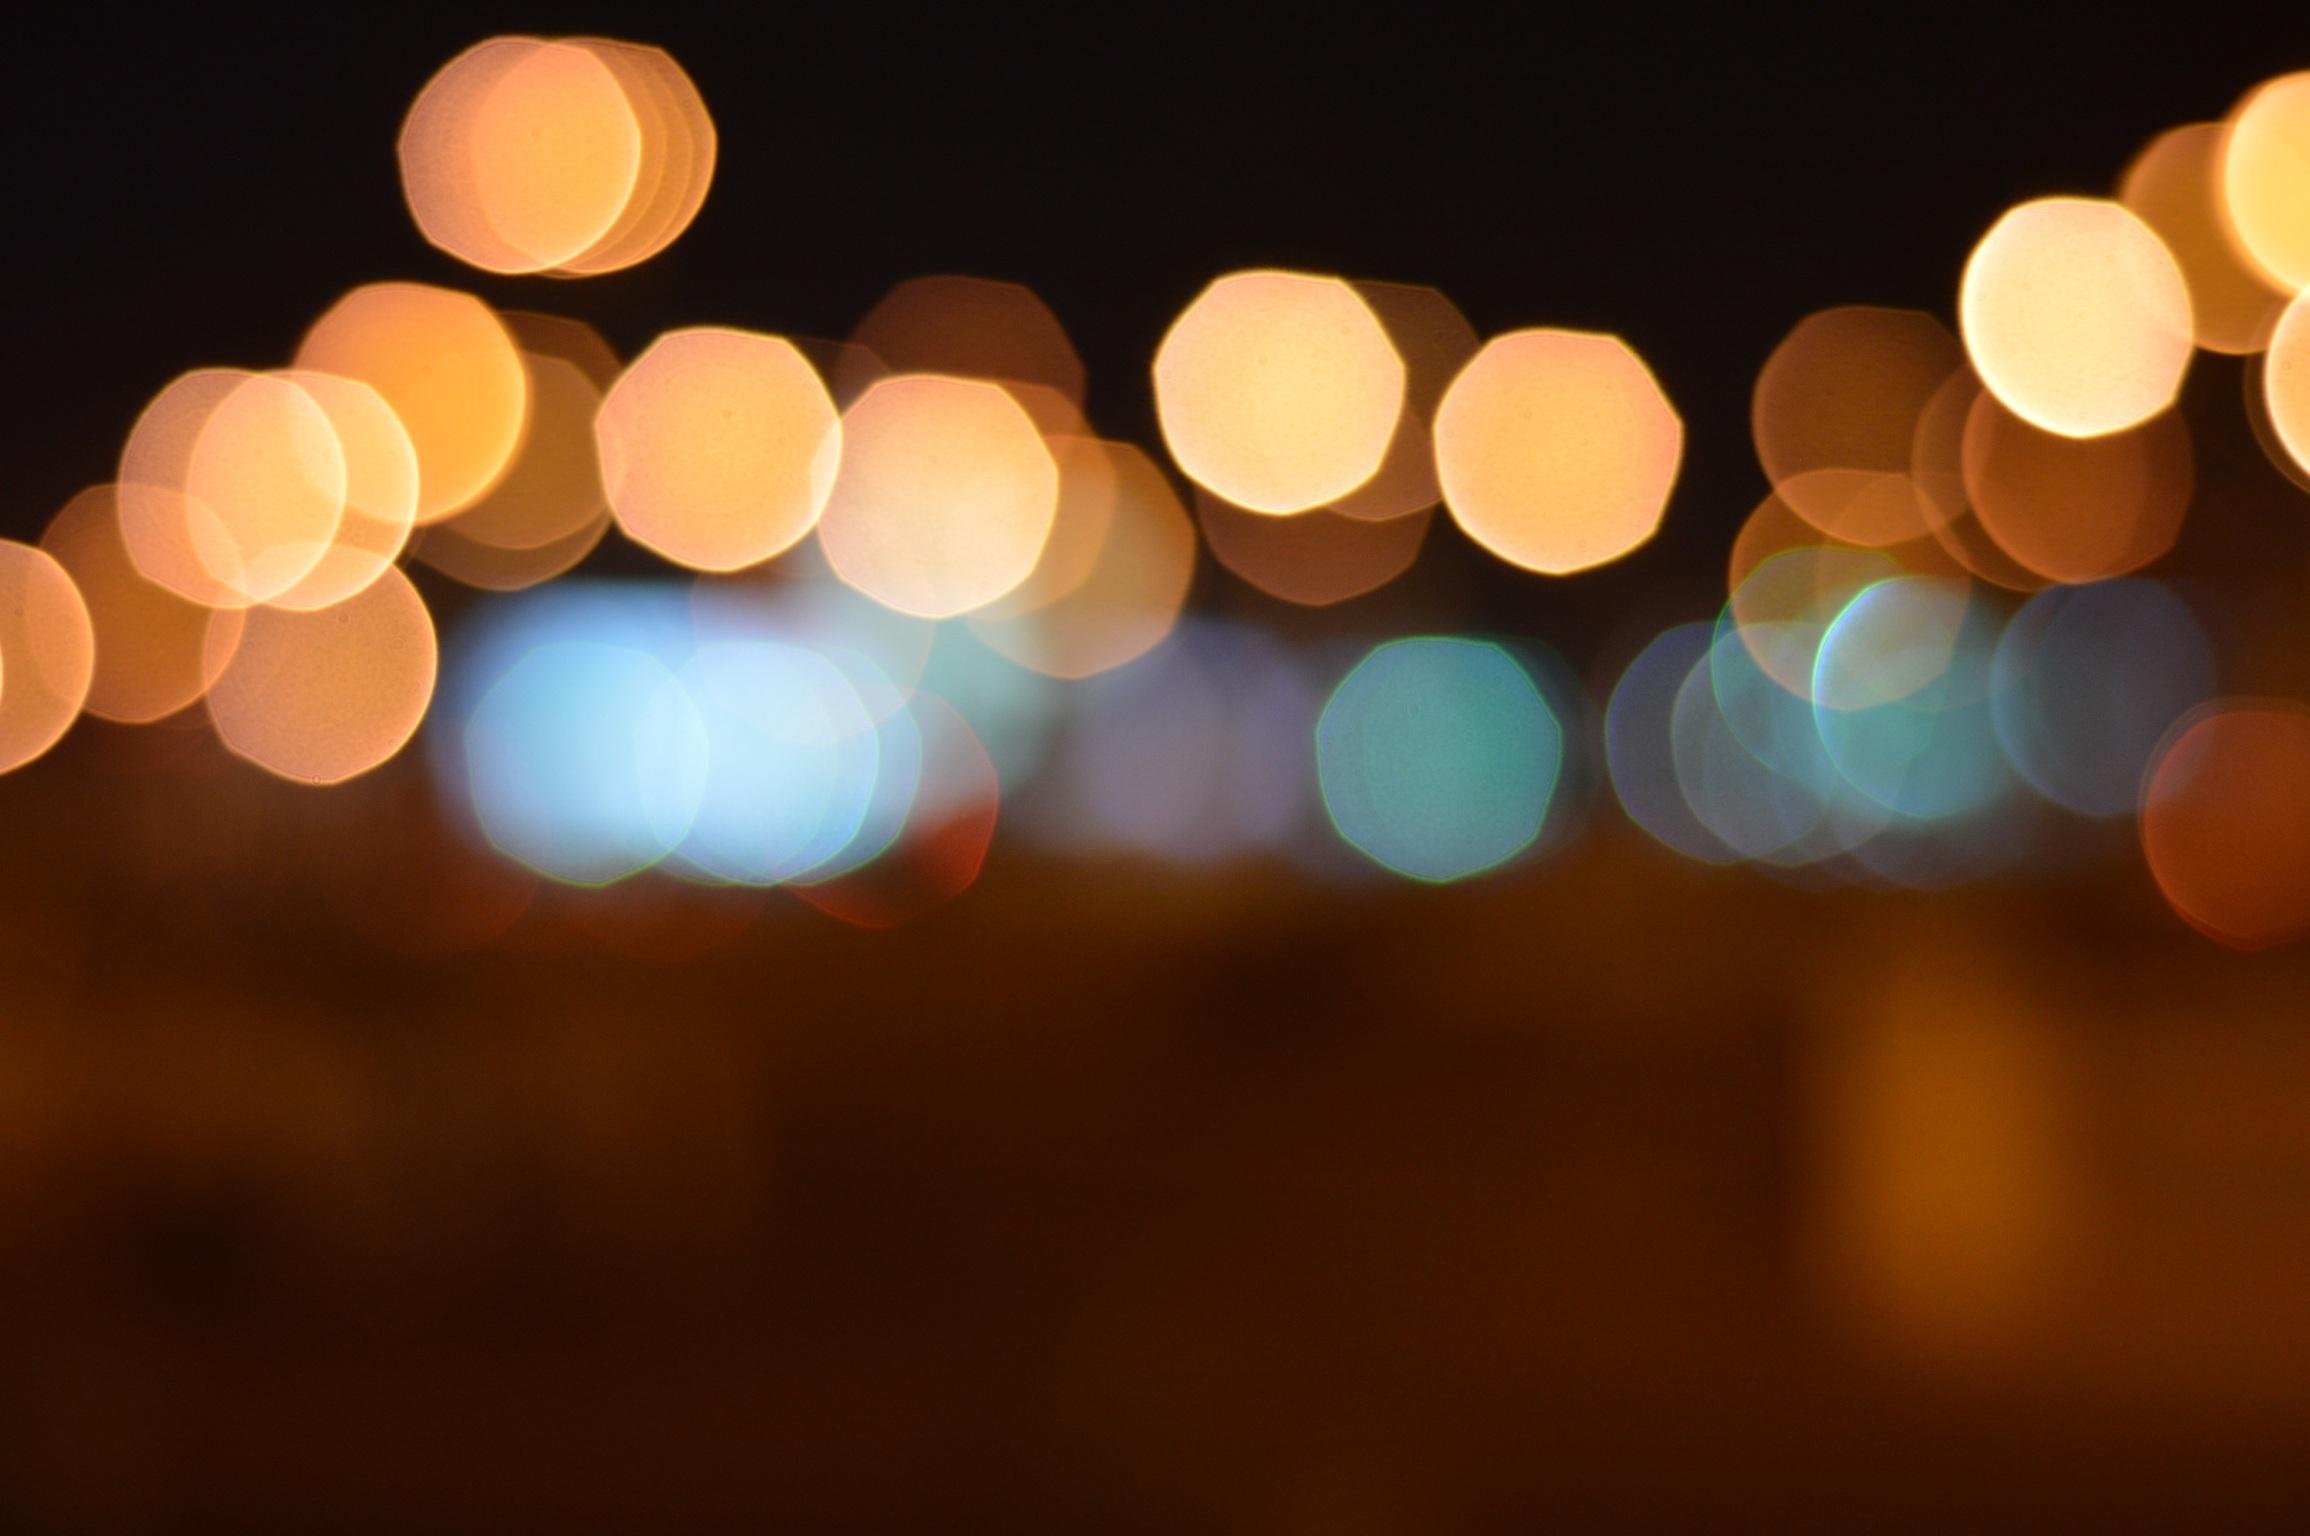 Night Lights Fondo De Pantalla Hd Fondo De Escritorio